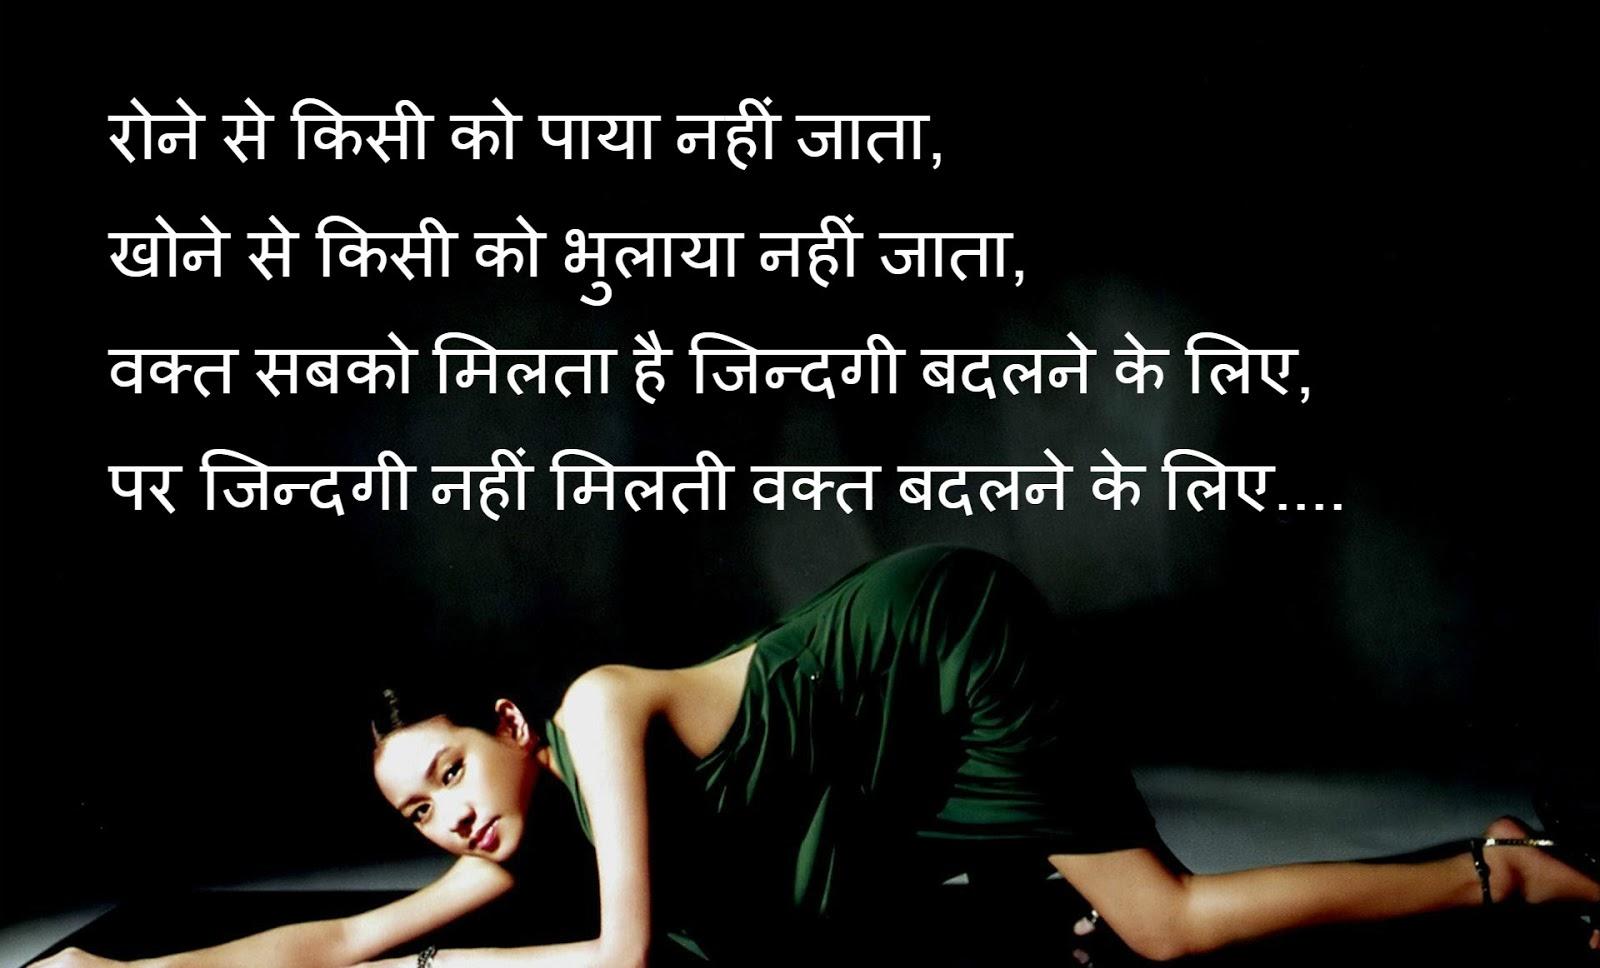 Shayari hi shayari images download dard ishq love zindagi for Koi 5 vigyapan in hindi